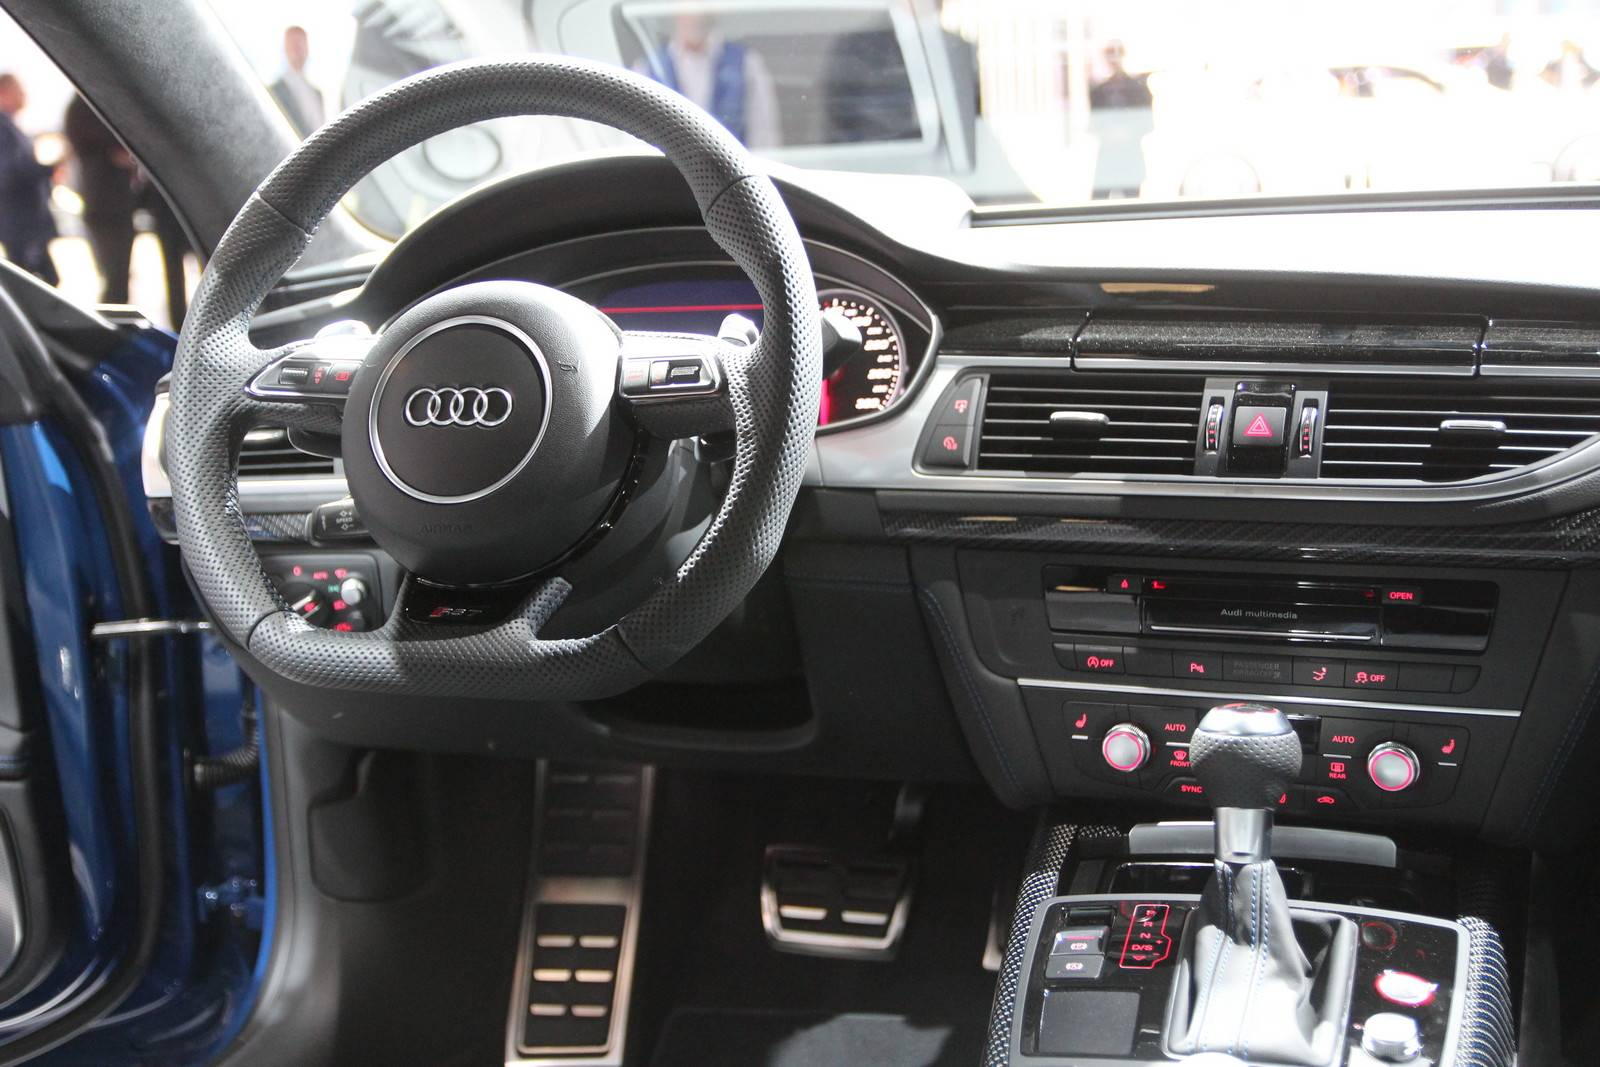 2016 Audi Rs7 Performance At La Show 7